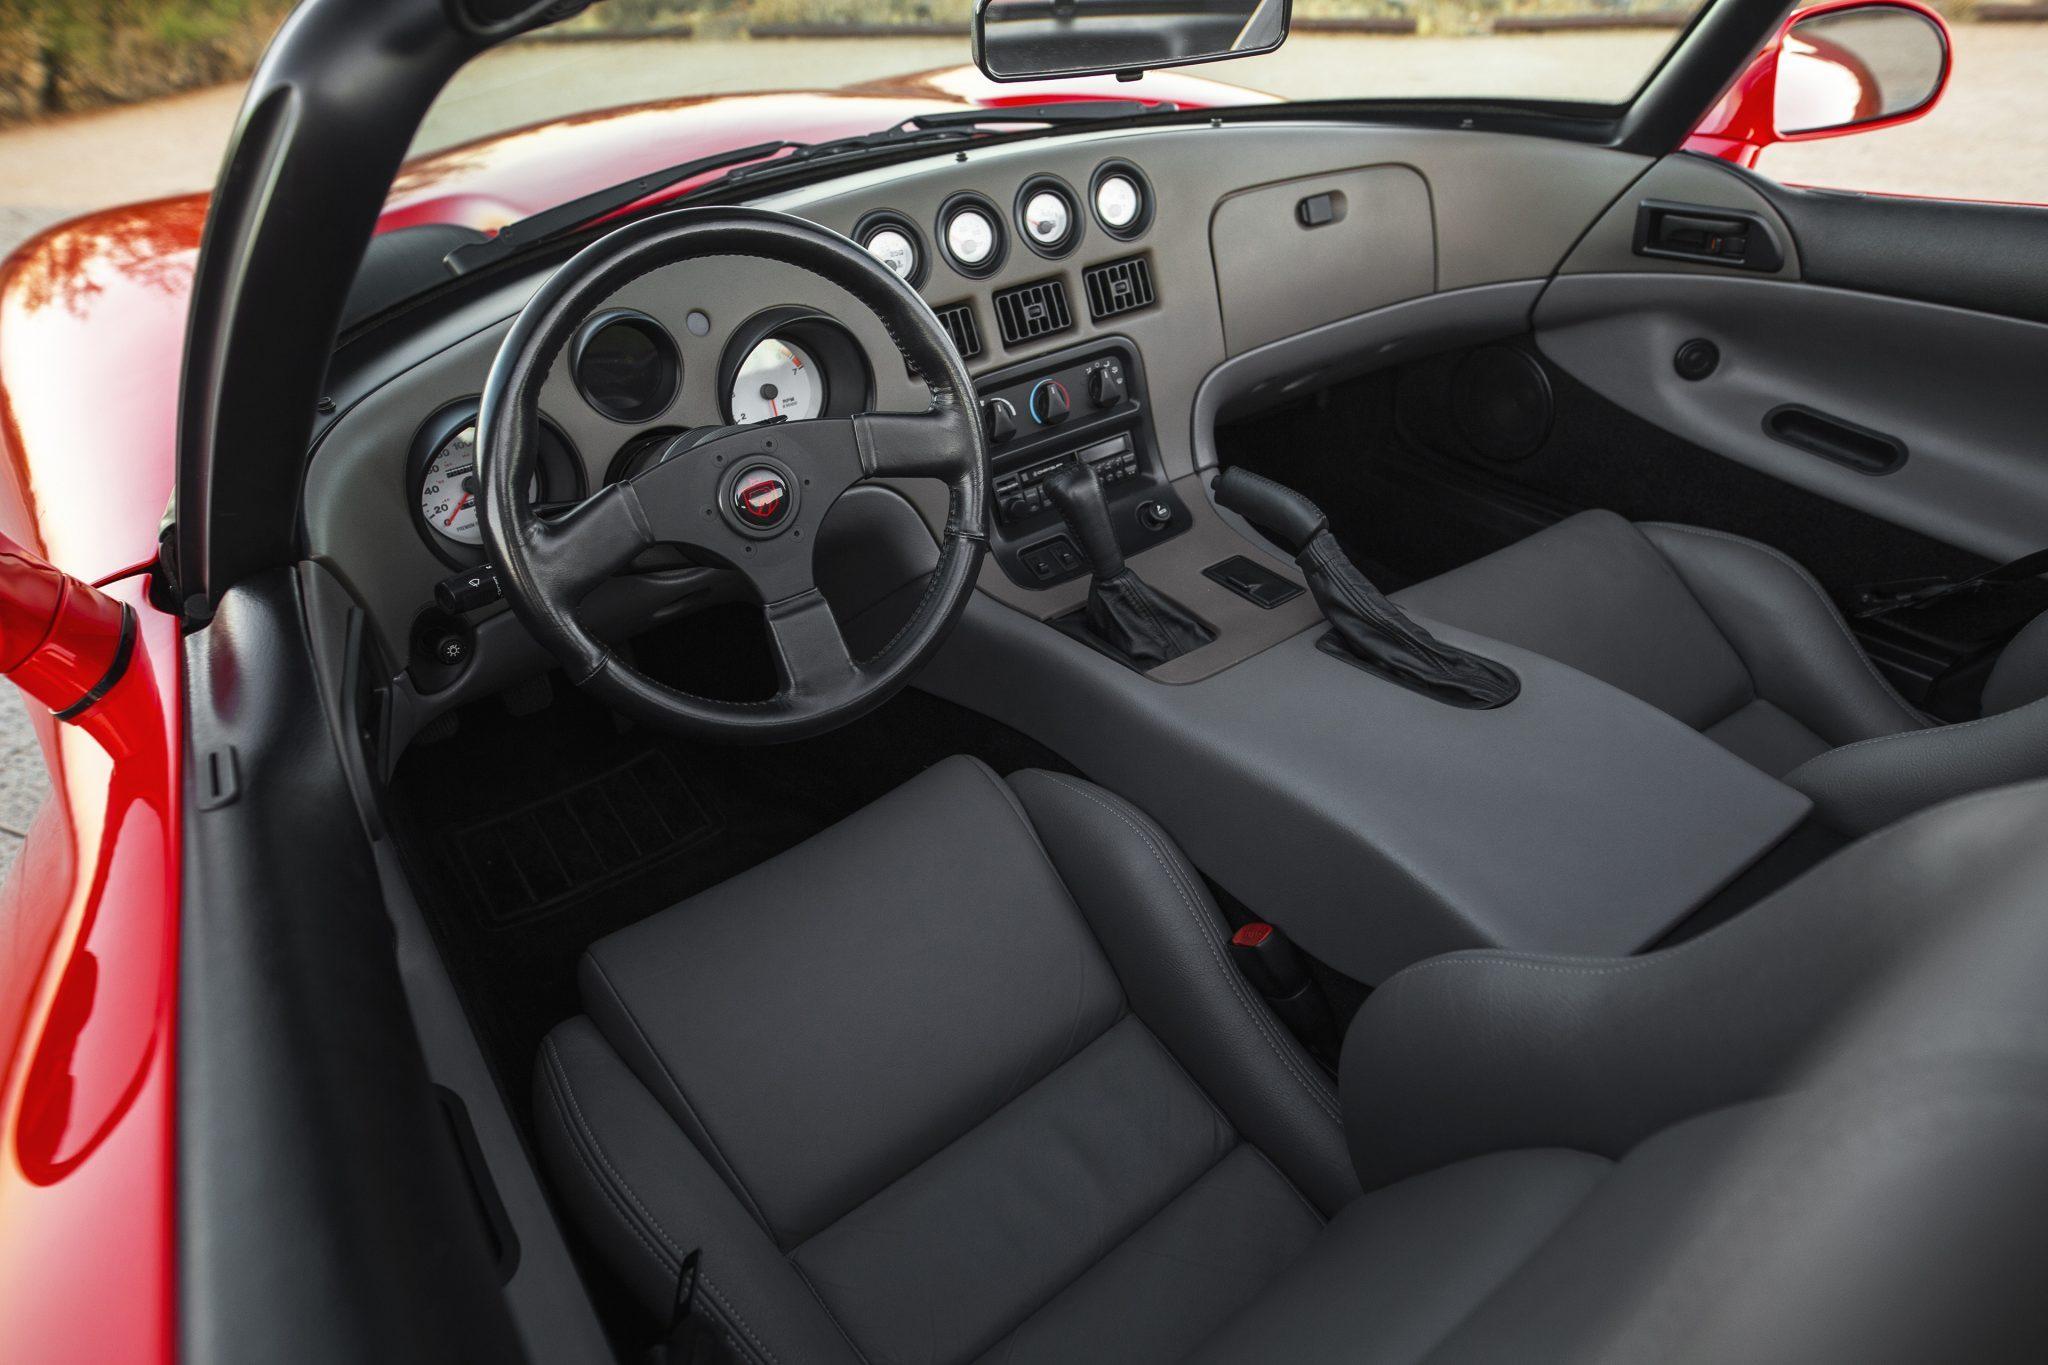 1992 Dodge Viper RT-10 interior